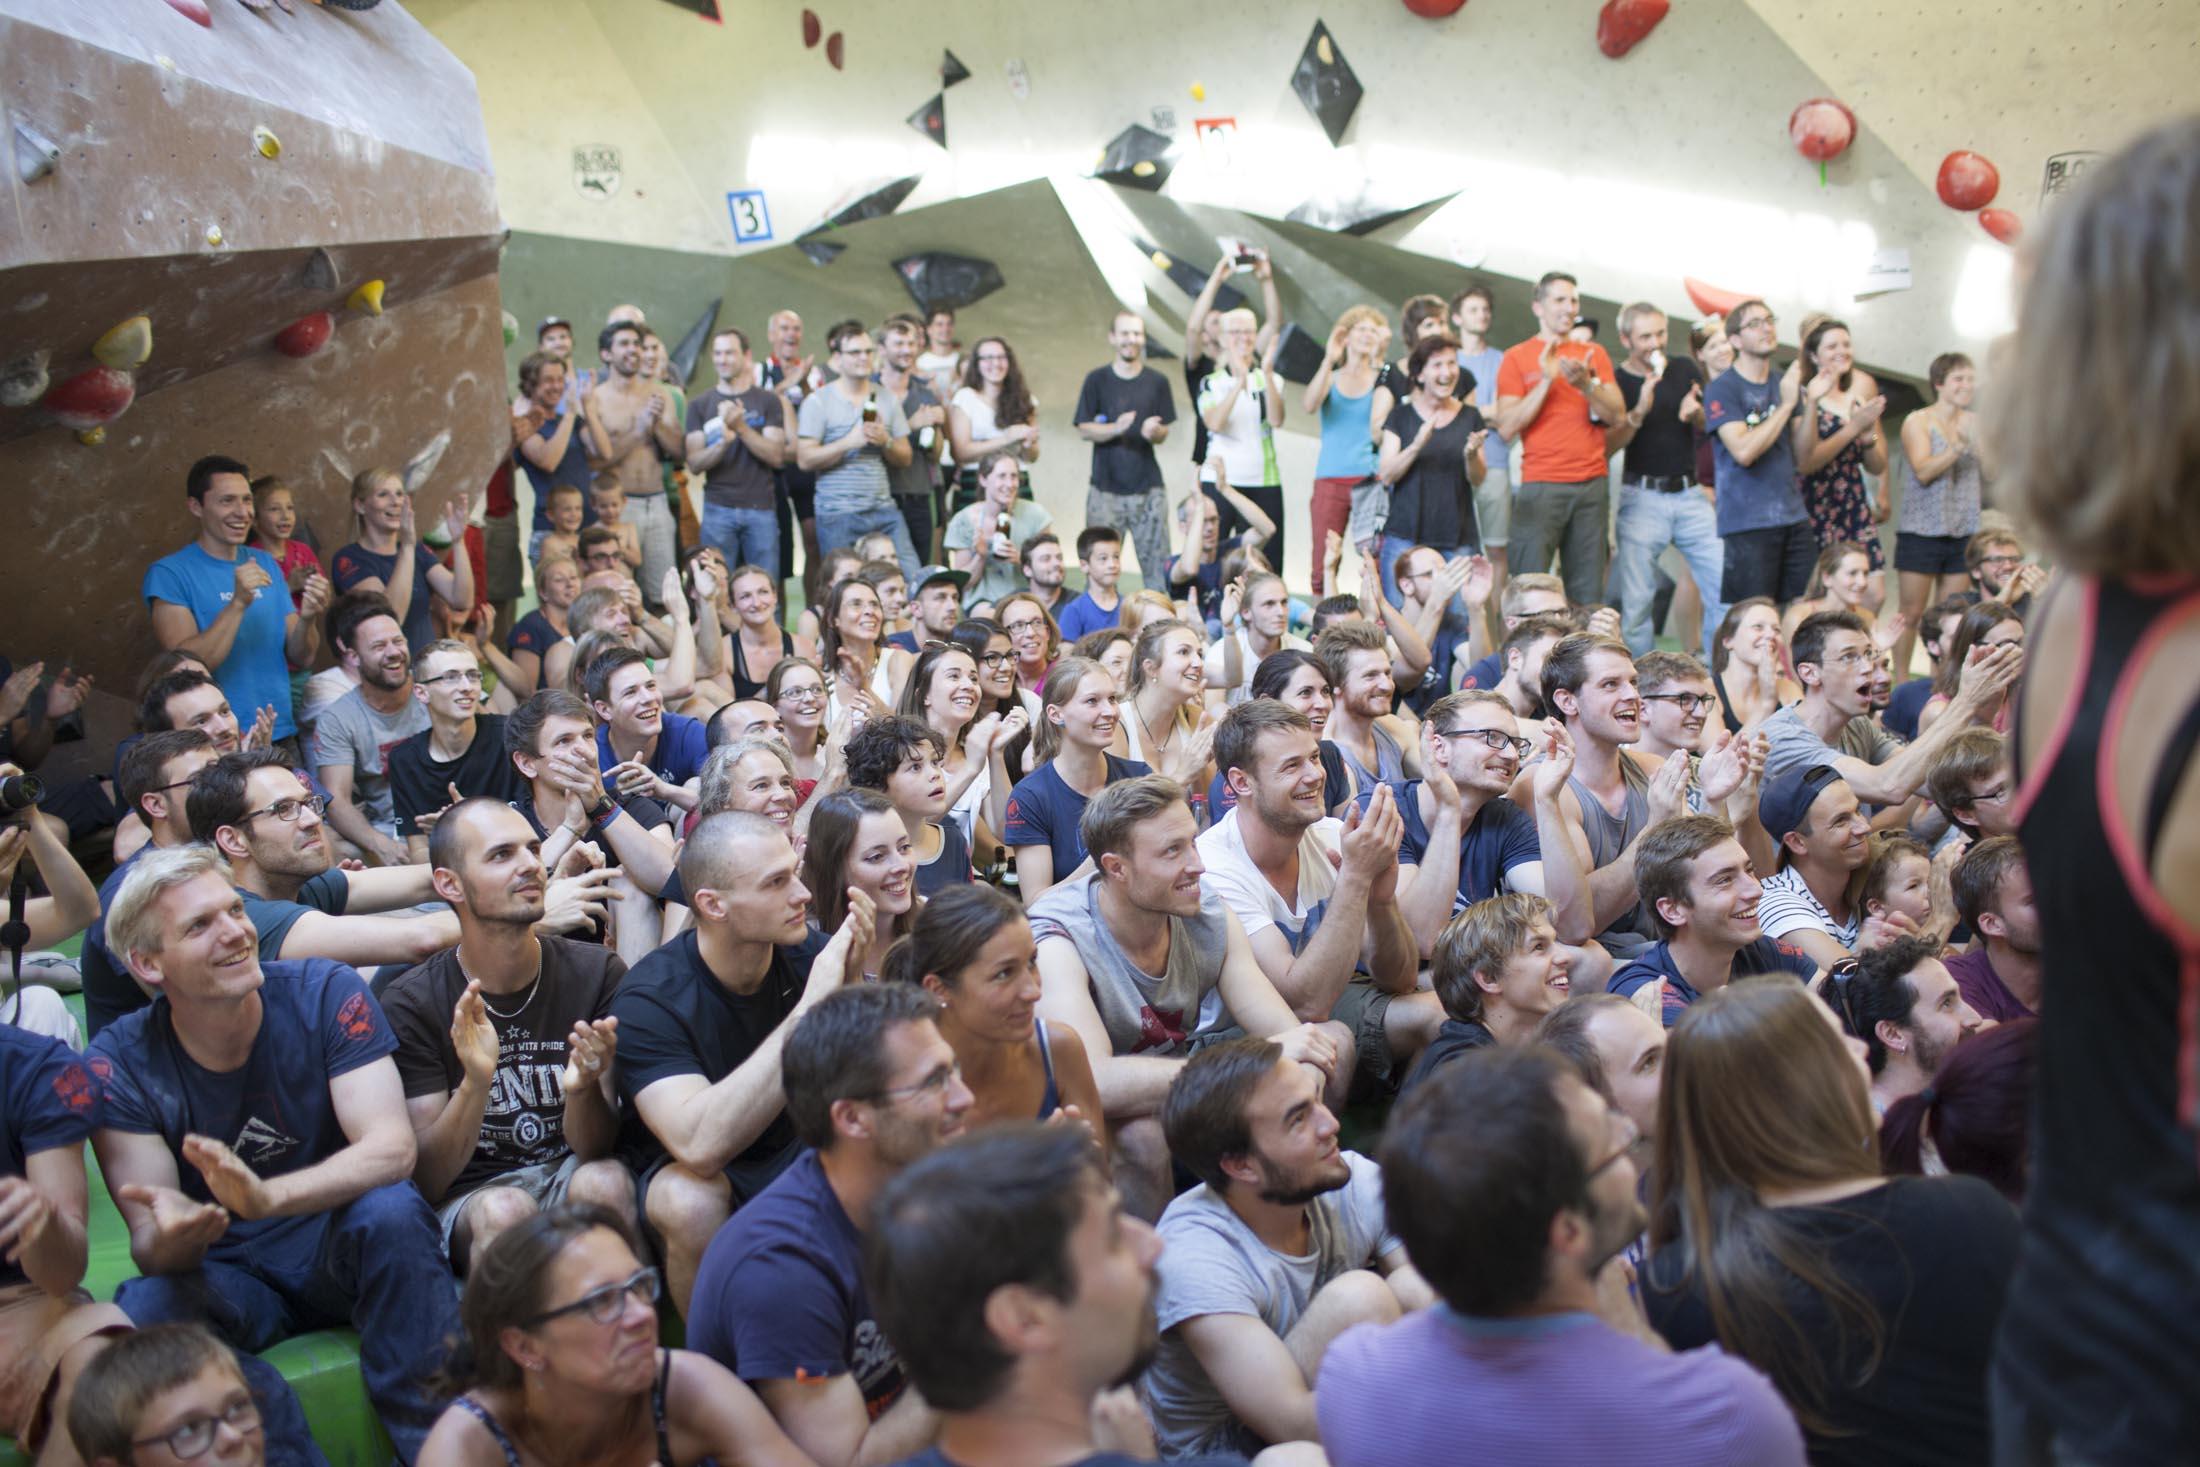 Finale, internationaler bouldercup Frankenjura 2016, BLOCKHELDEN Erlangen, Mammut, Bergfreunde.de, Boulderwettkampf07092016541